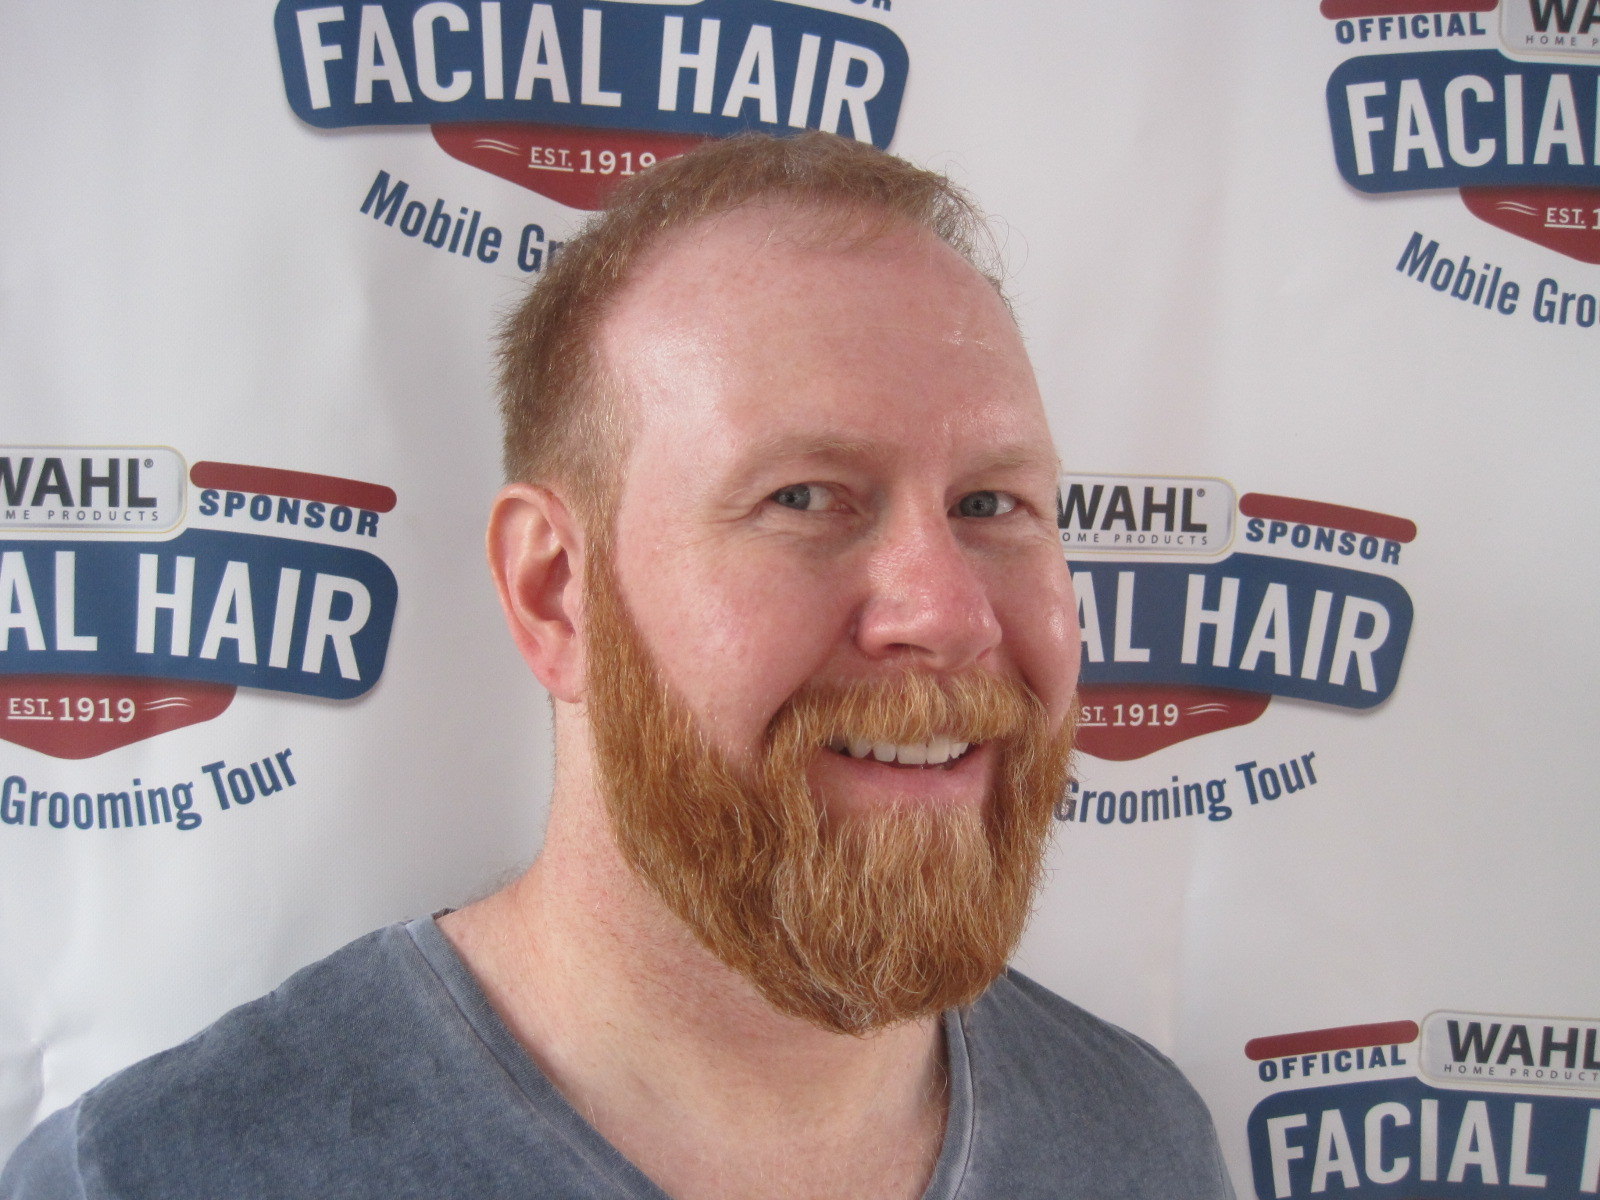 Alexandria man has the 'best beard in America'